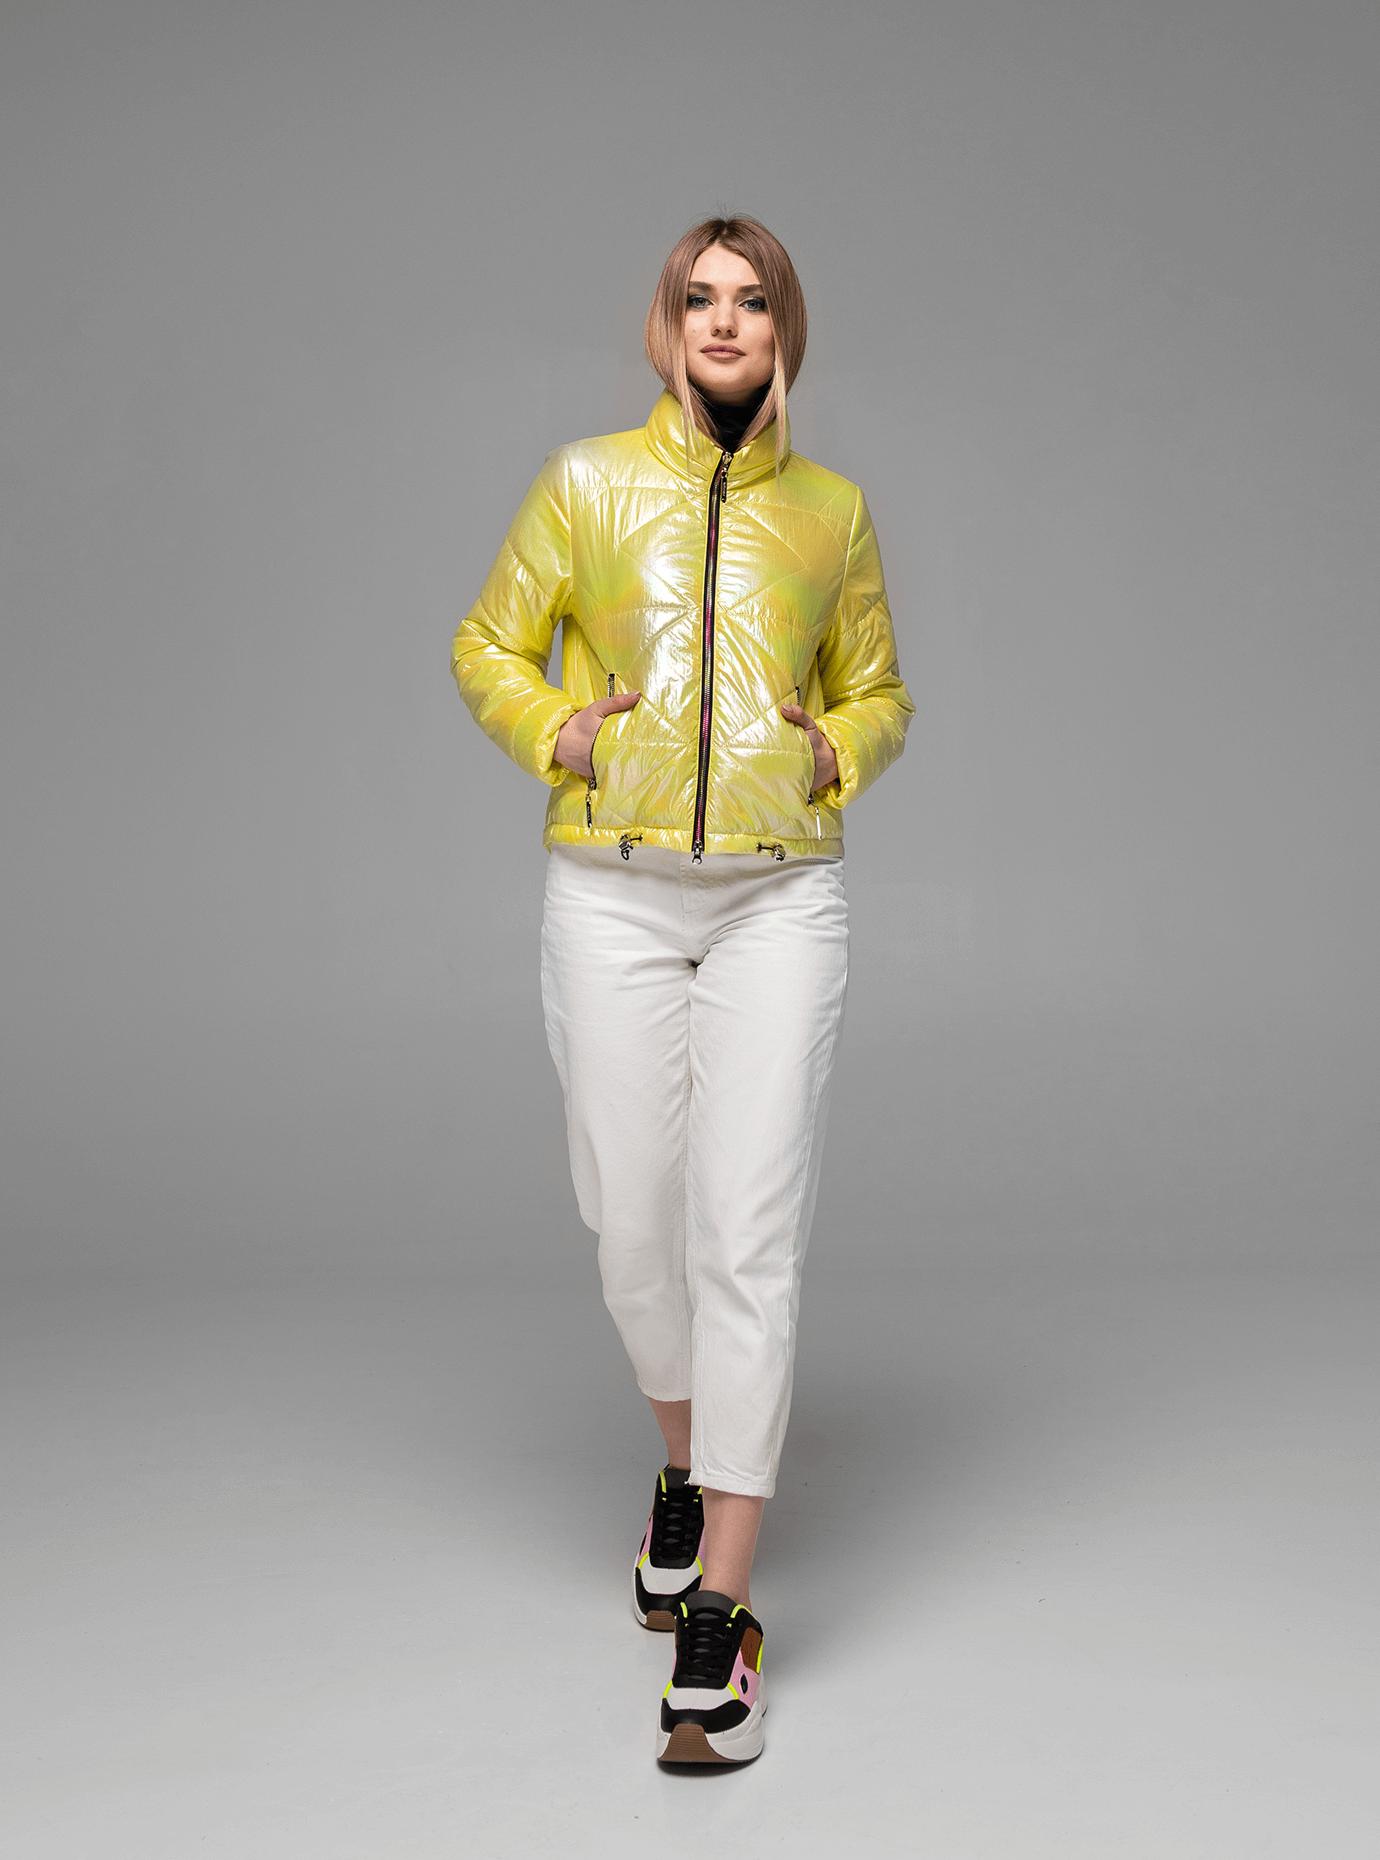 Жіноча демісезонна куртка хамелеон Жовтий 42 (02-KT190065): фото - Alster.ua